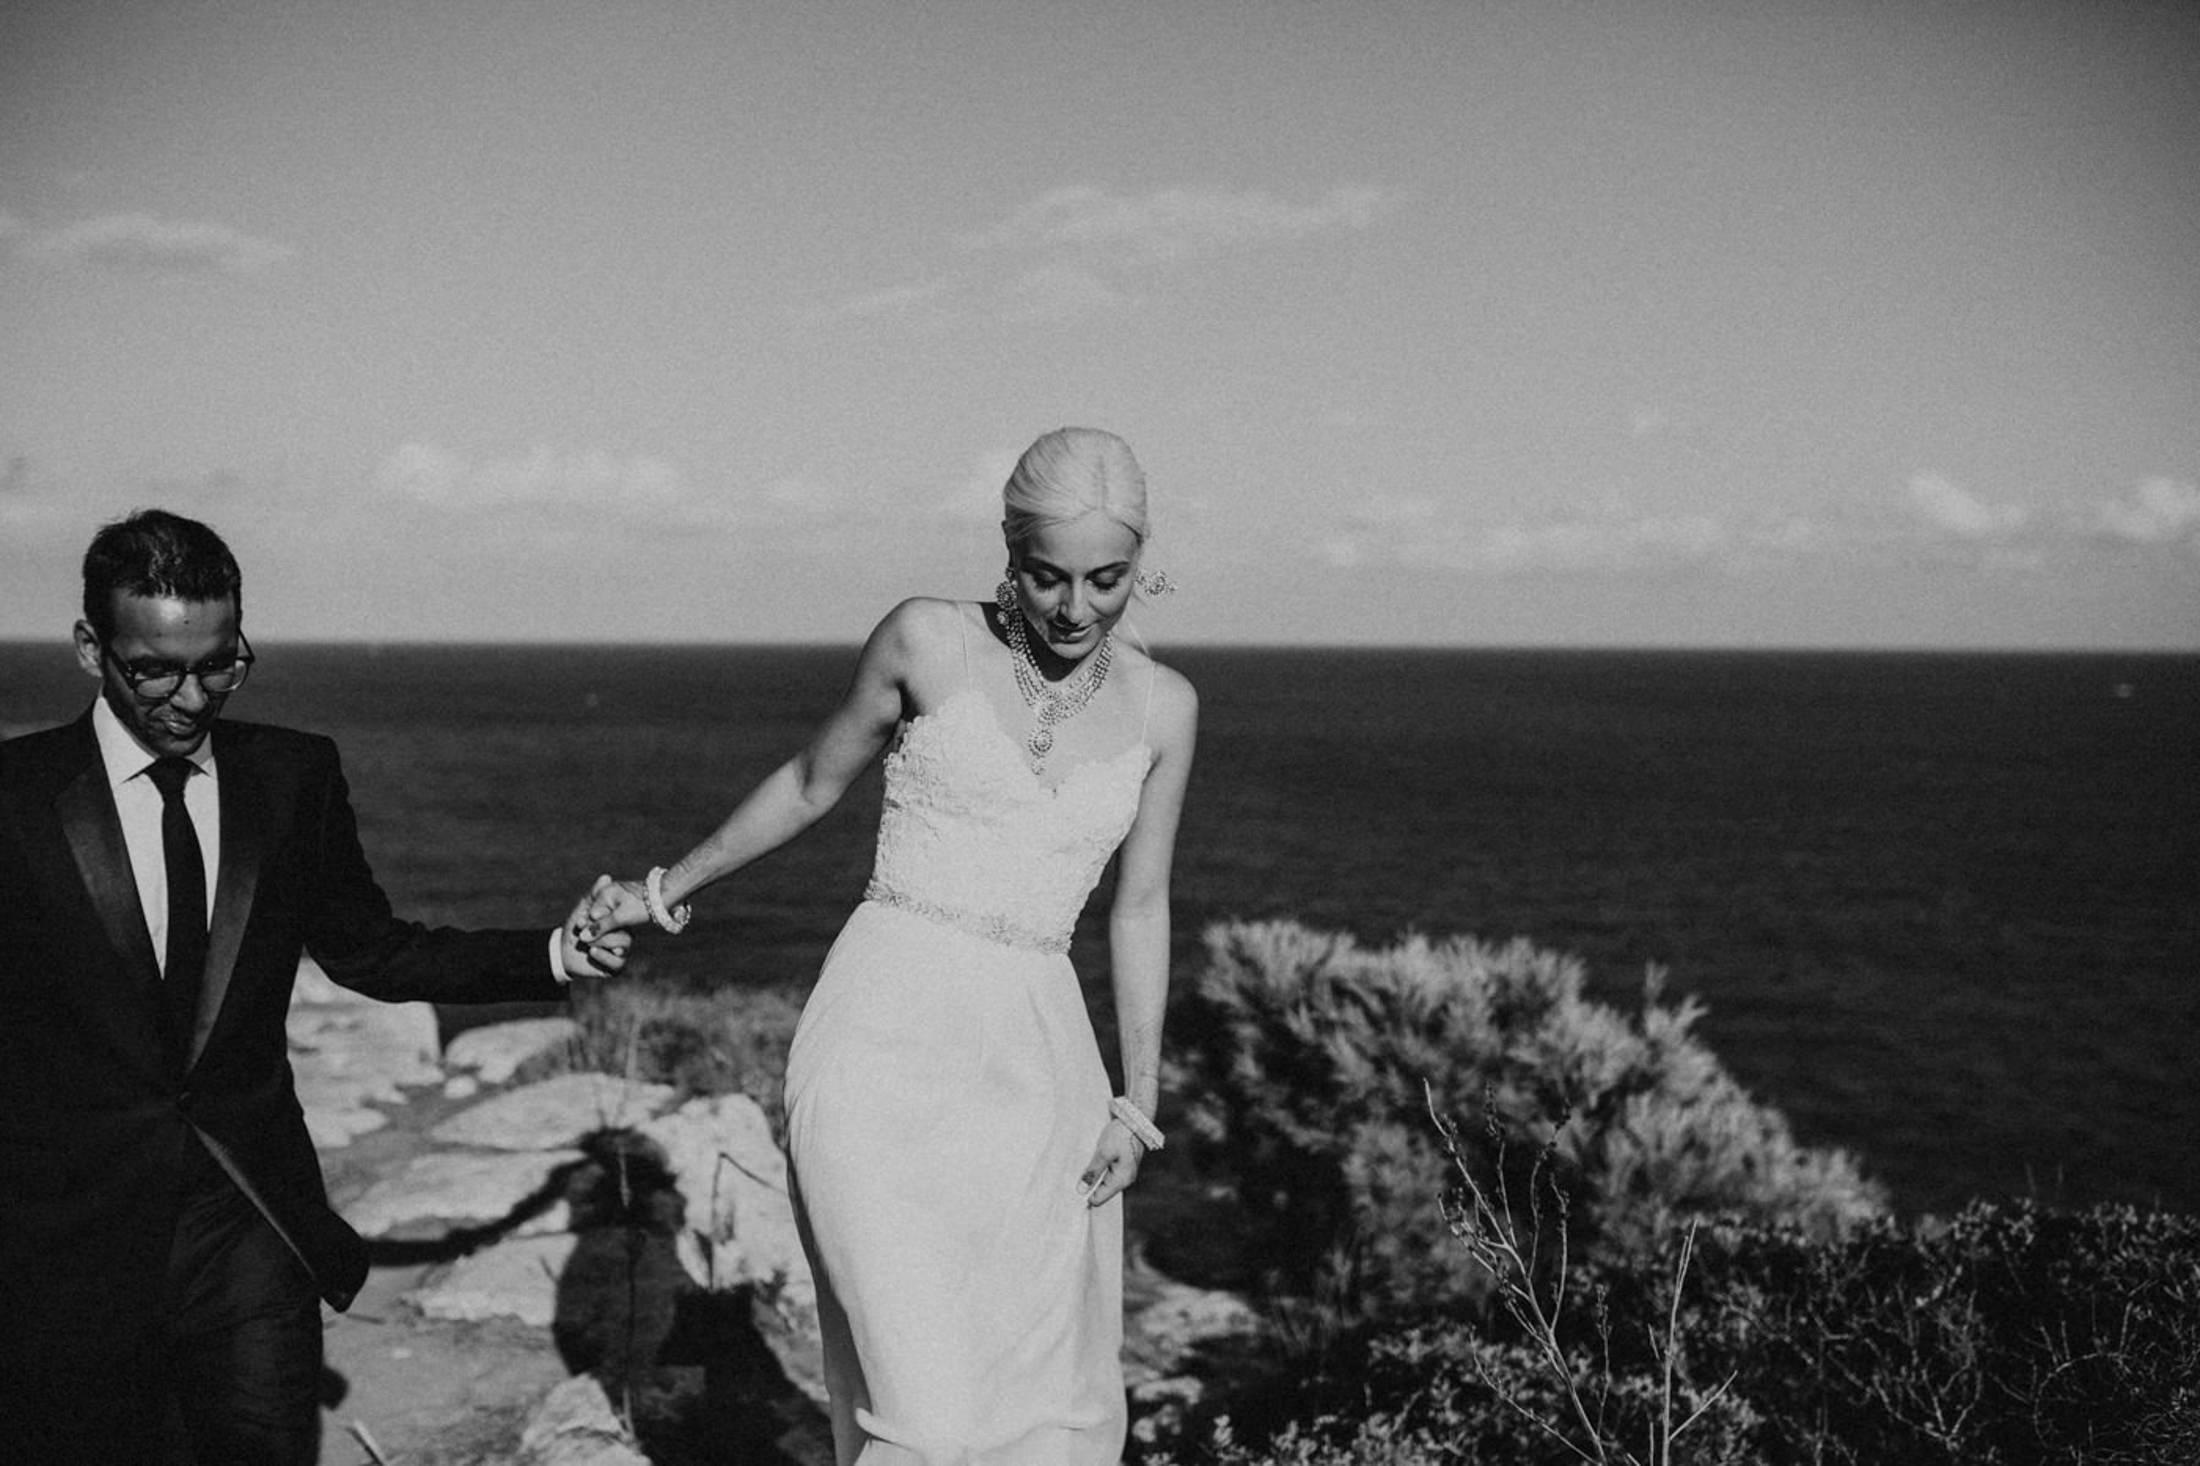 Wedding_Photographer_Mallorca_Daniela-Marquardt_Photography_New_York_Iceland_Tuscany_Santorini_Portugal_Austria_Bavaria_Elopement_Hochzeitsfotograf_AntjeRajat2_78